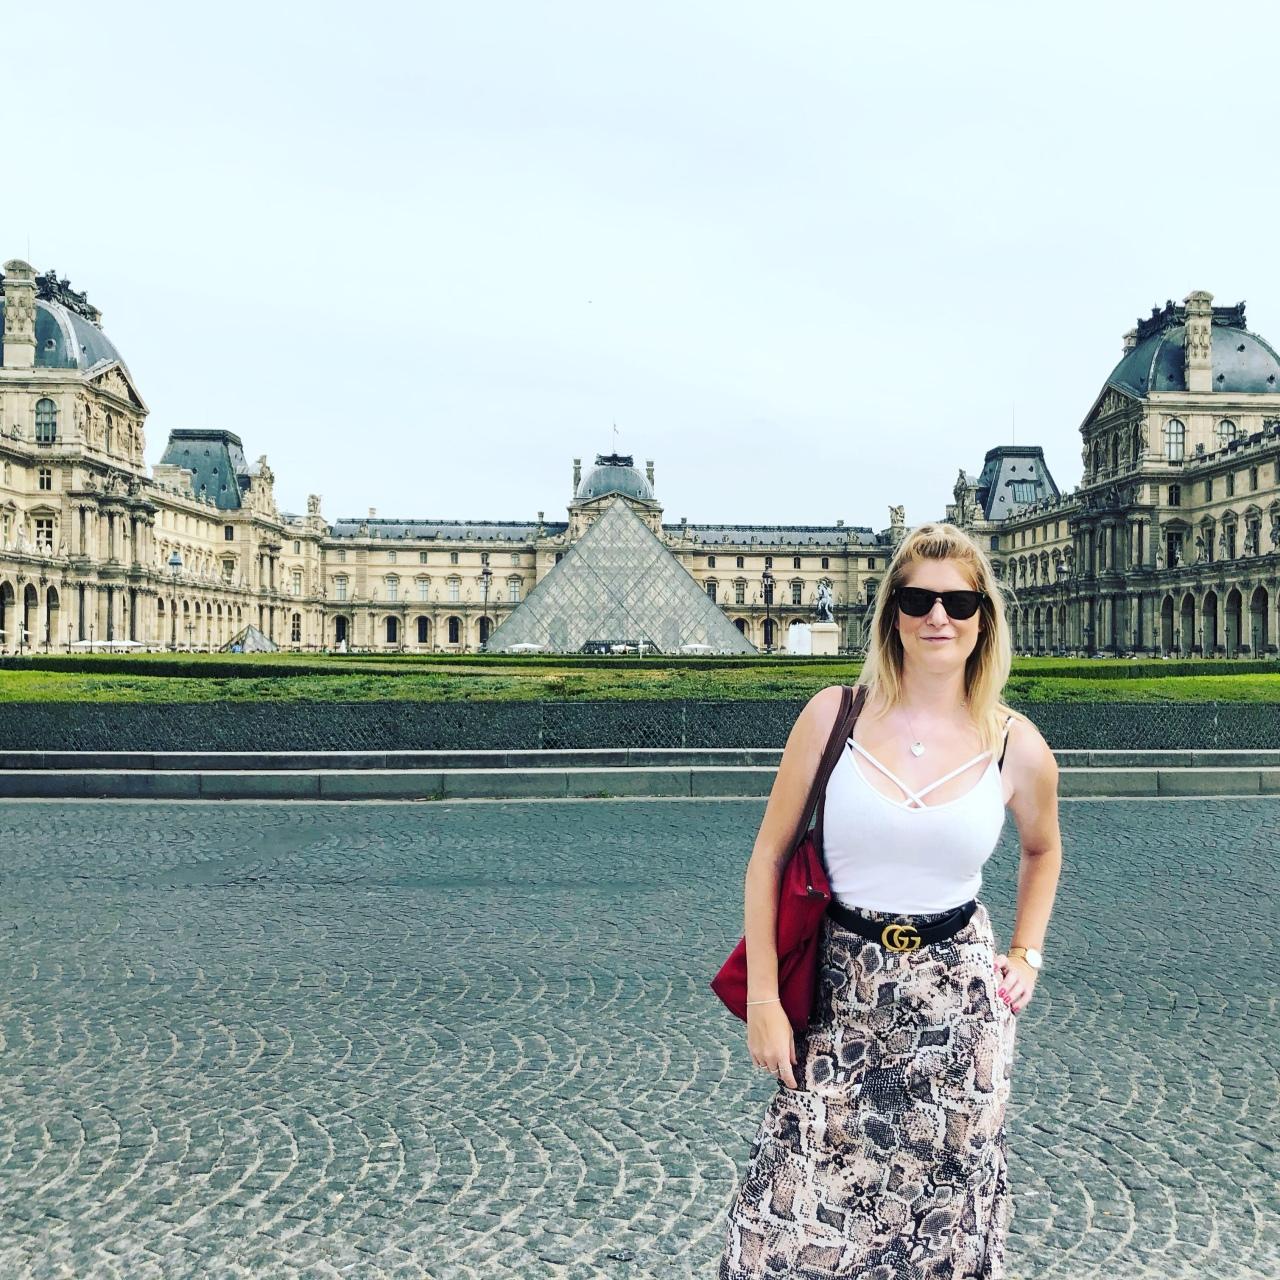 Louvre Paris instagram tips